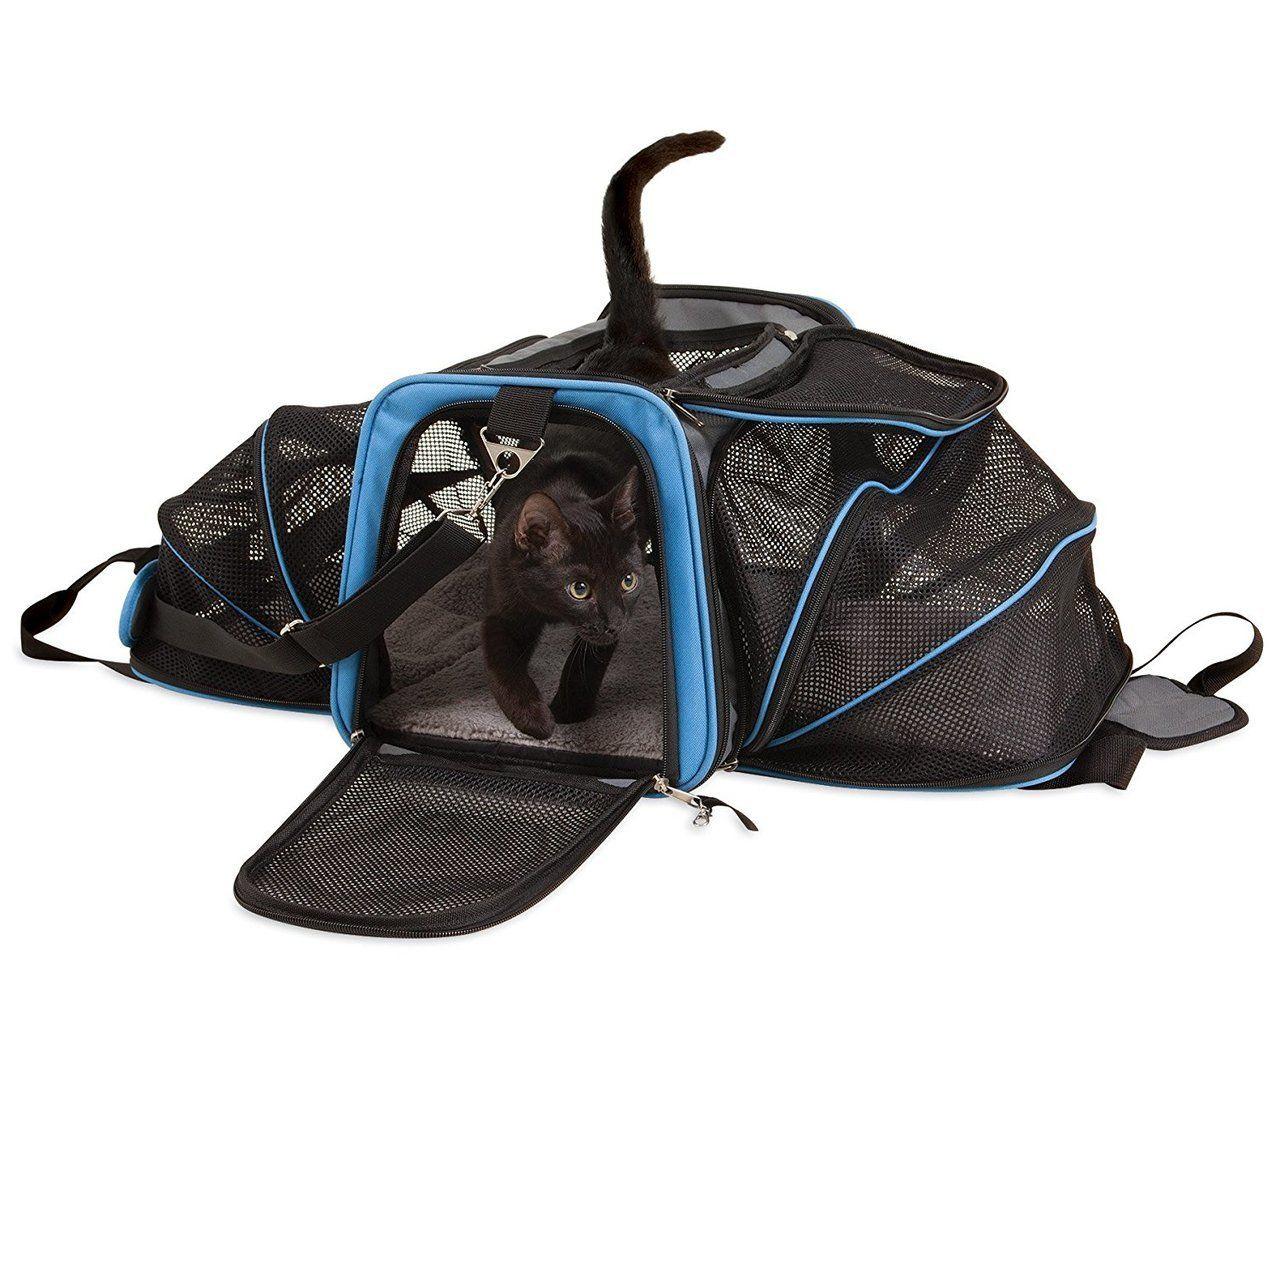 Double Extendable Cat Carrier Jackson Galaxy Store Cat